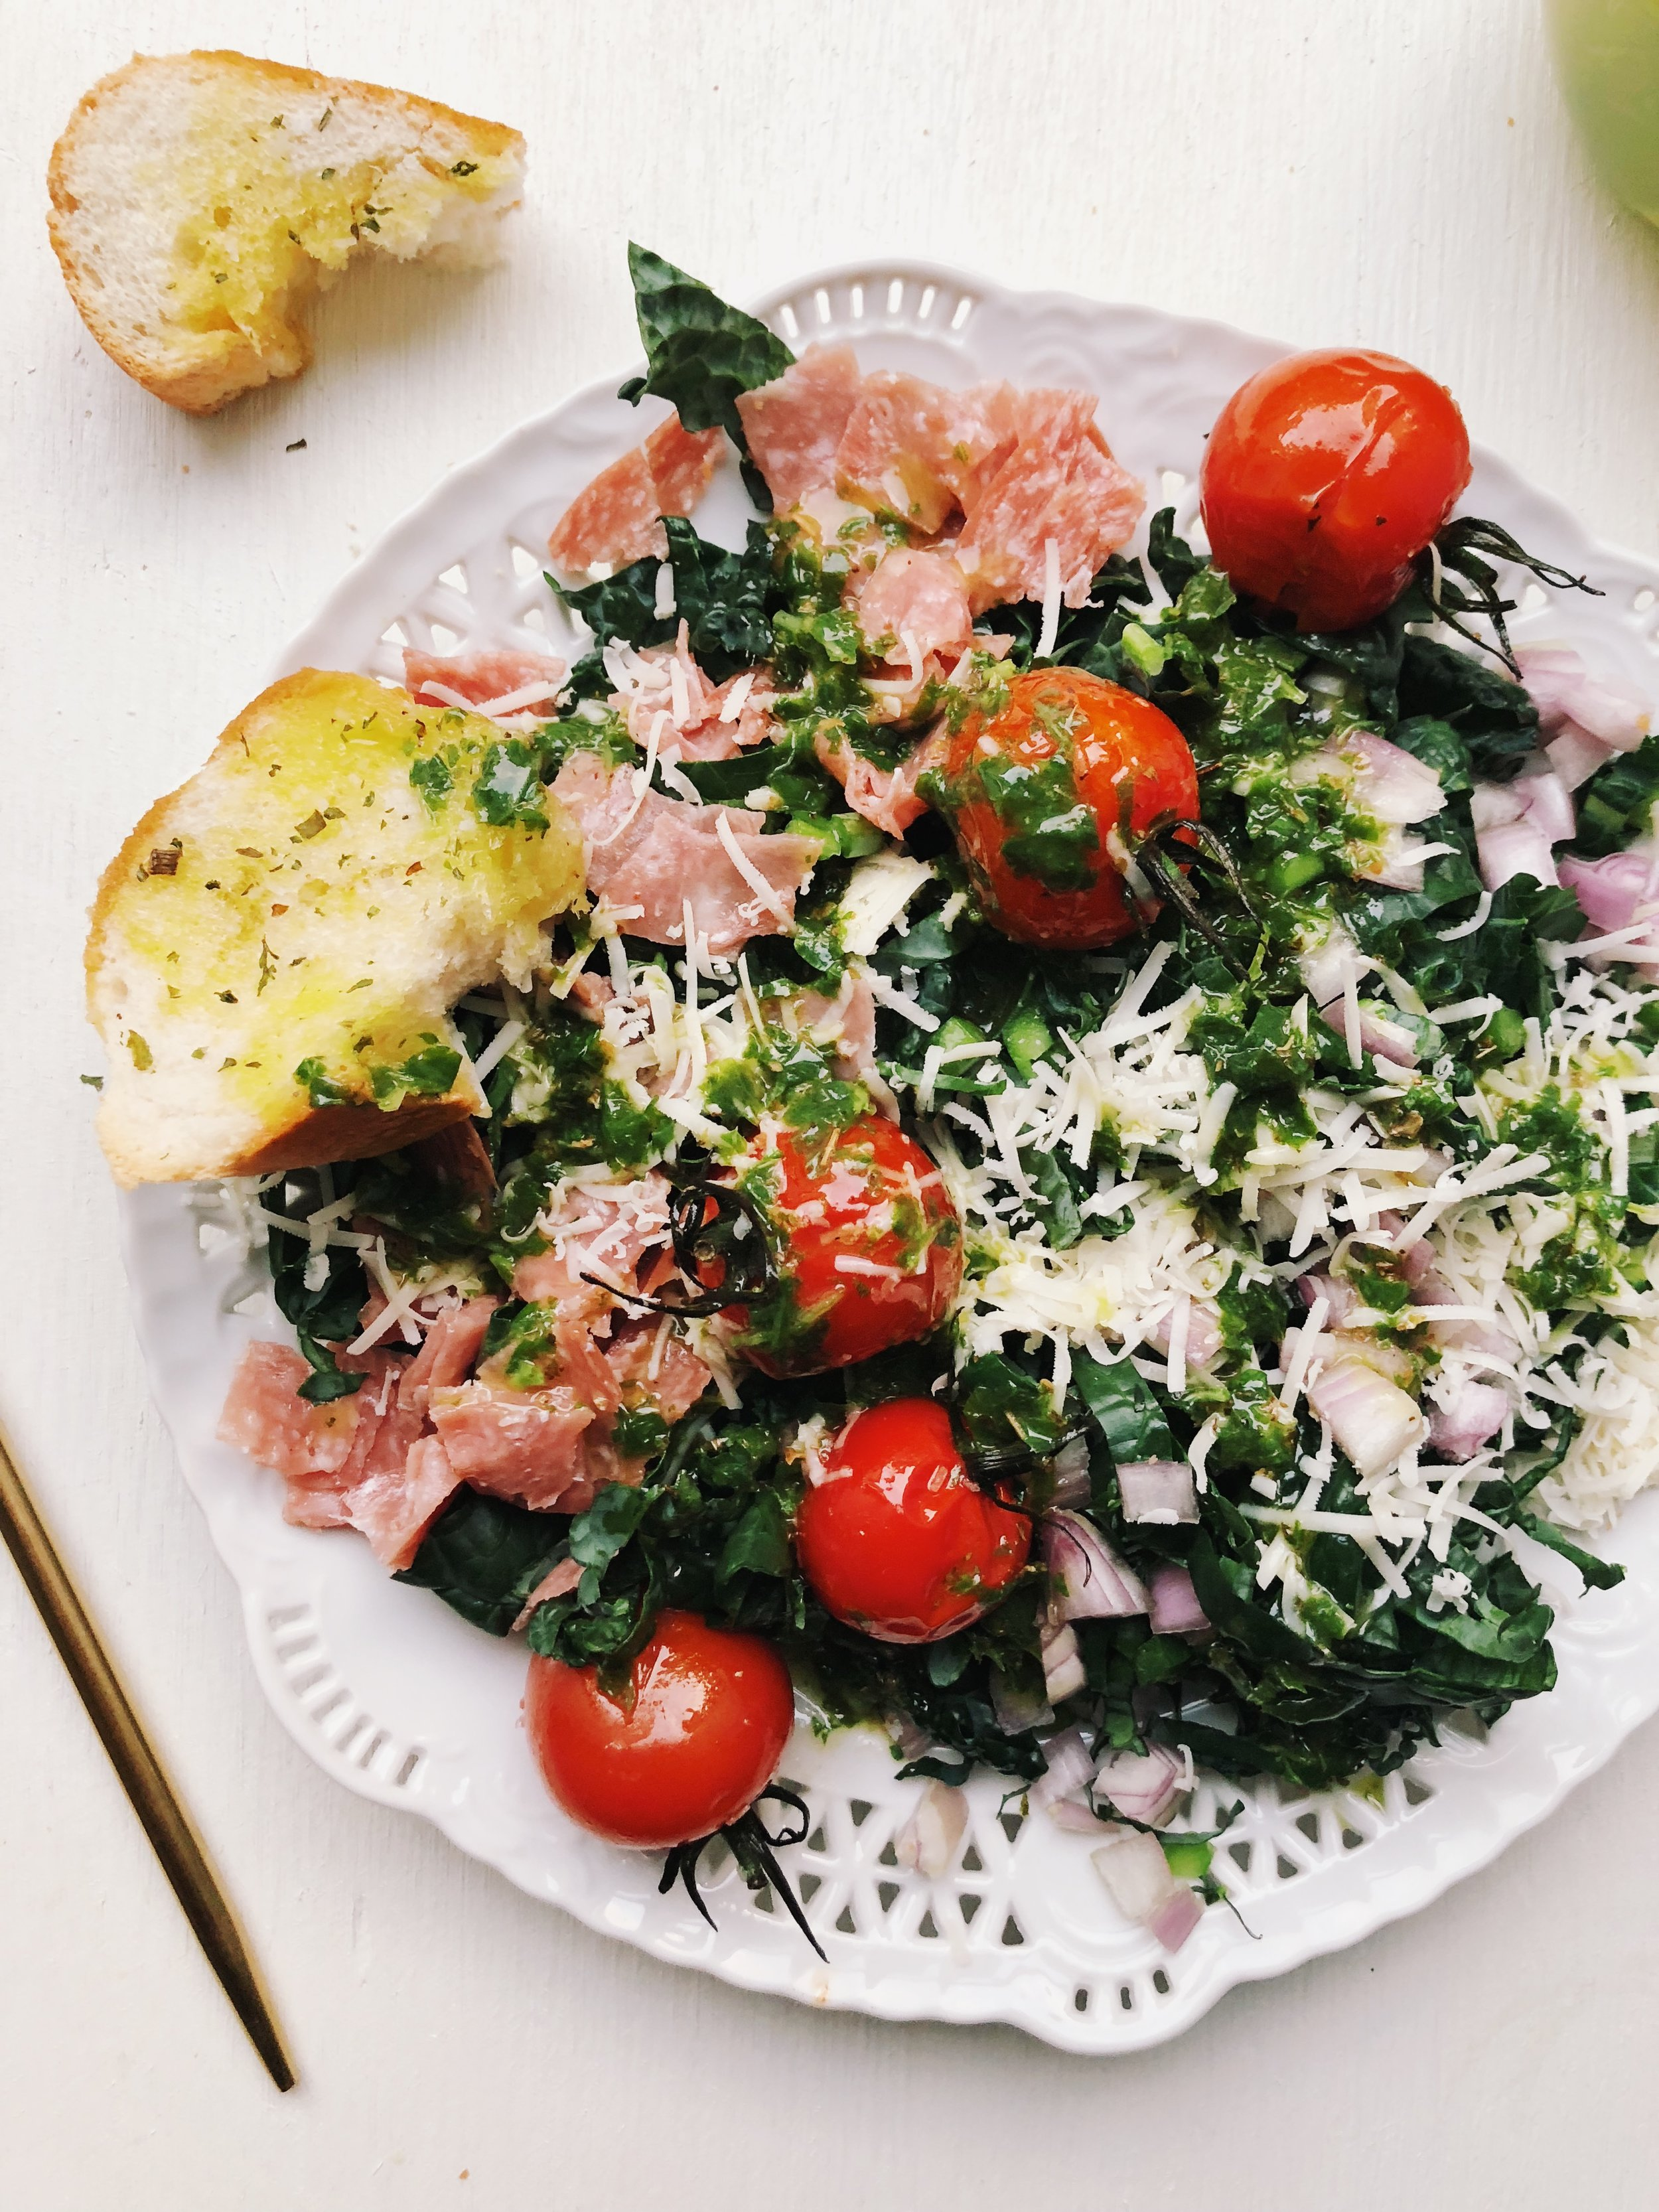 Tuscan Kale Chopped Salad with Sweet Basil Vinaigrette - tatichin.com